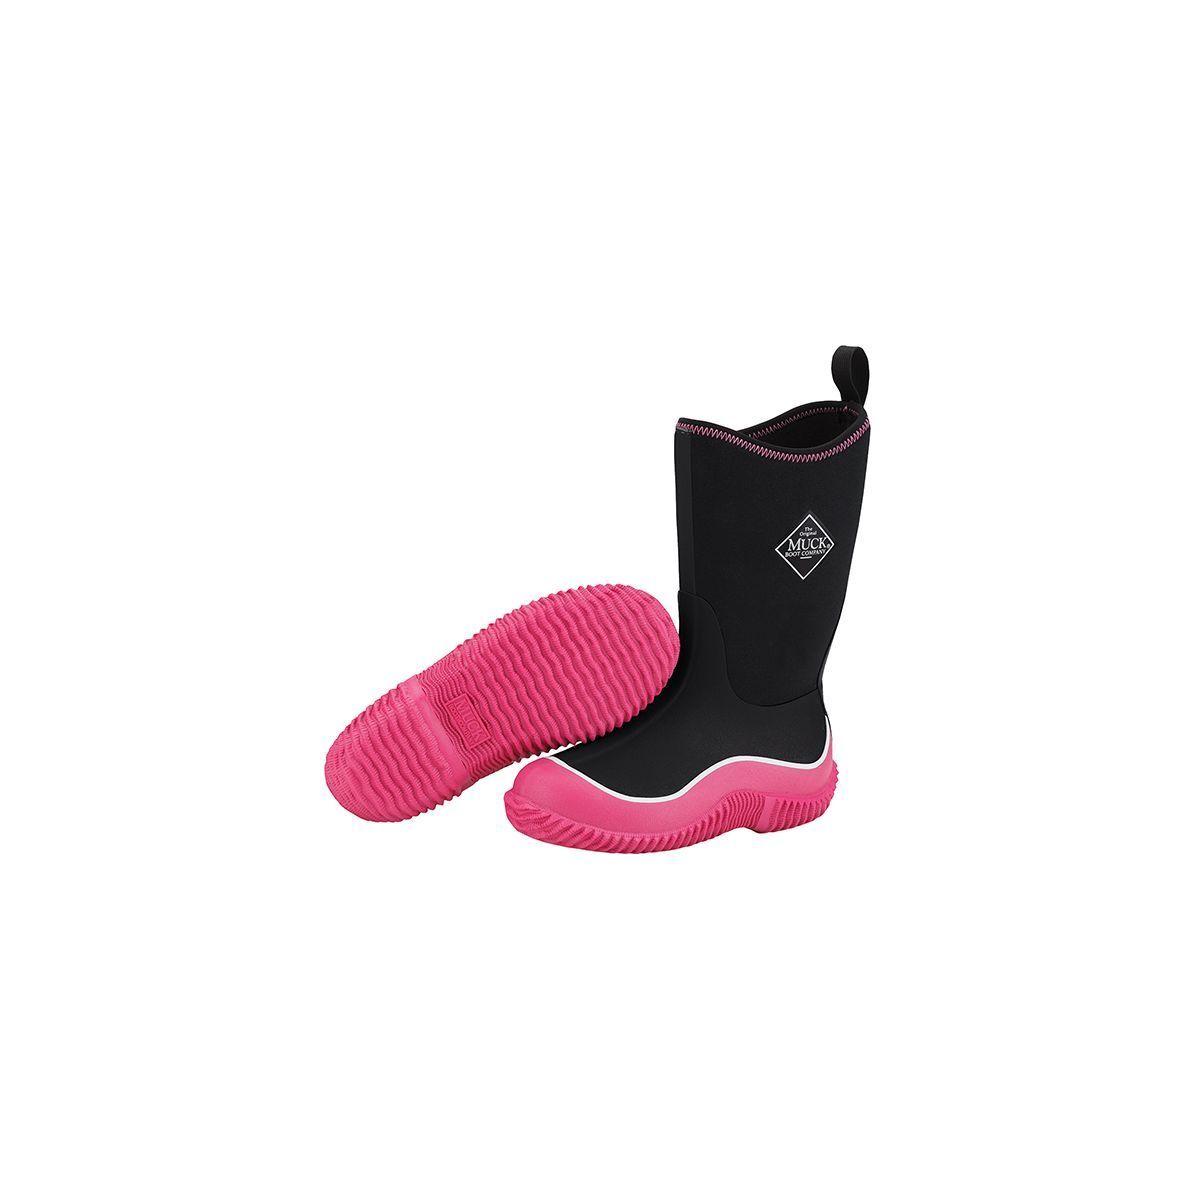 Muck Boots Company Kid's HALE, BLACK HOT PINK, Neoprene Rubber Waterproof